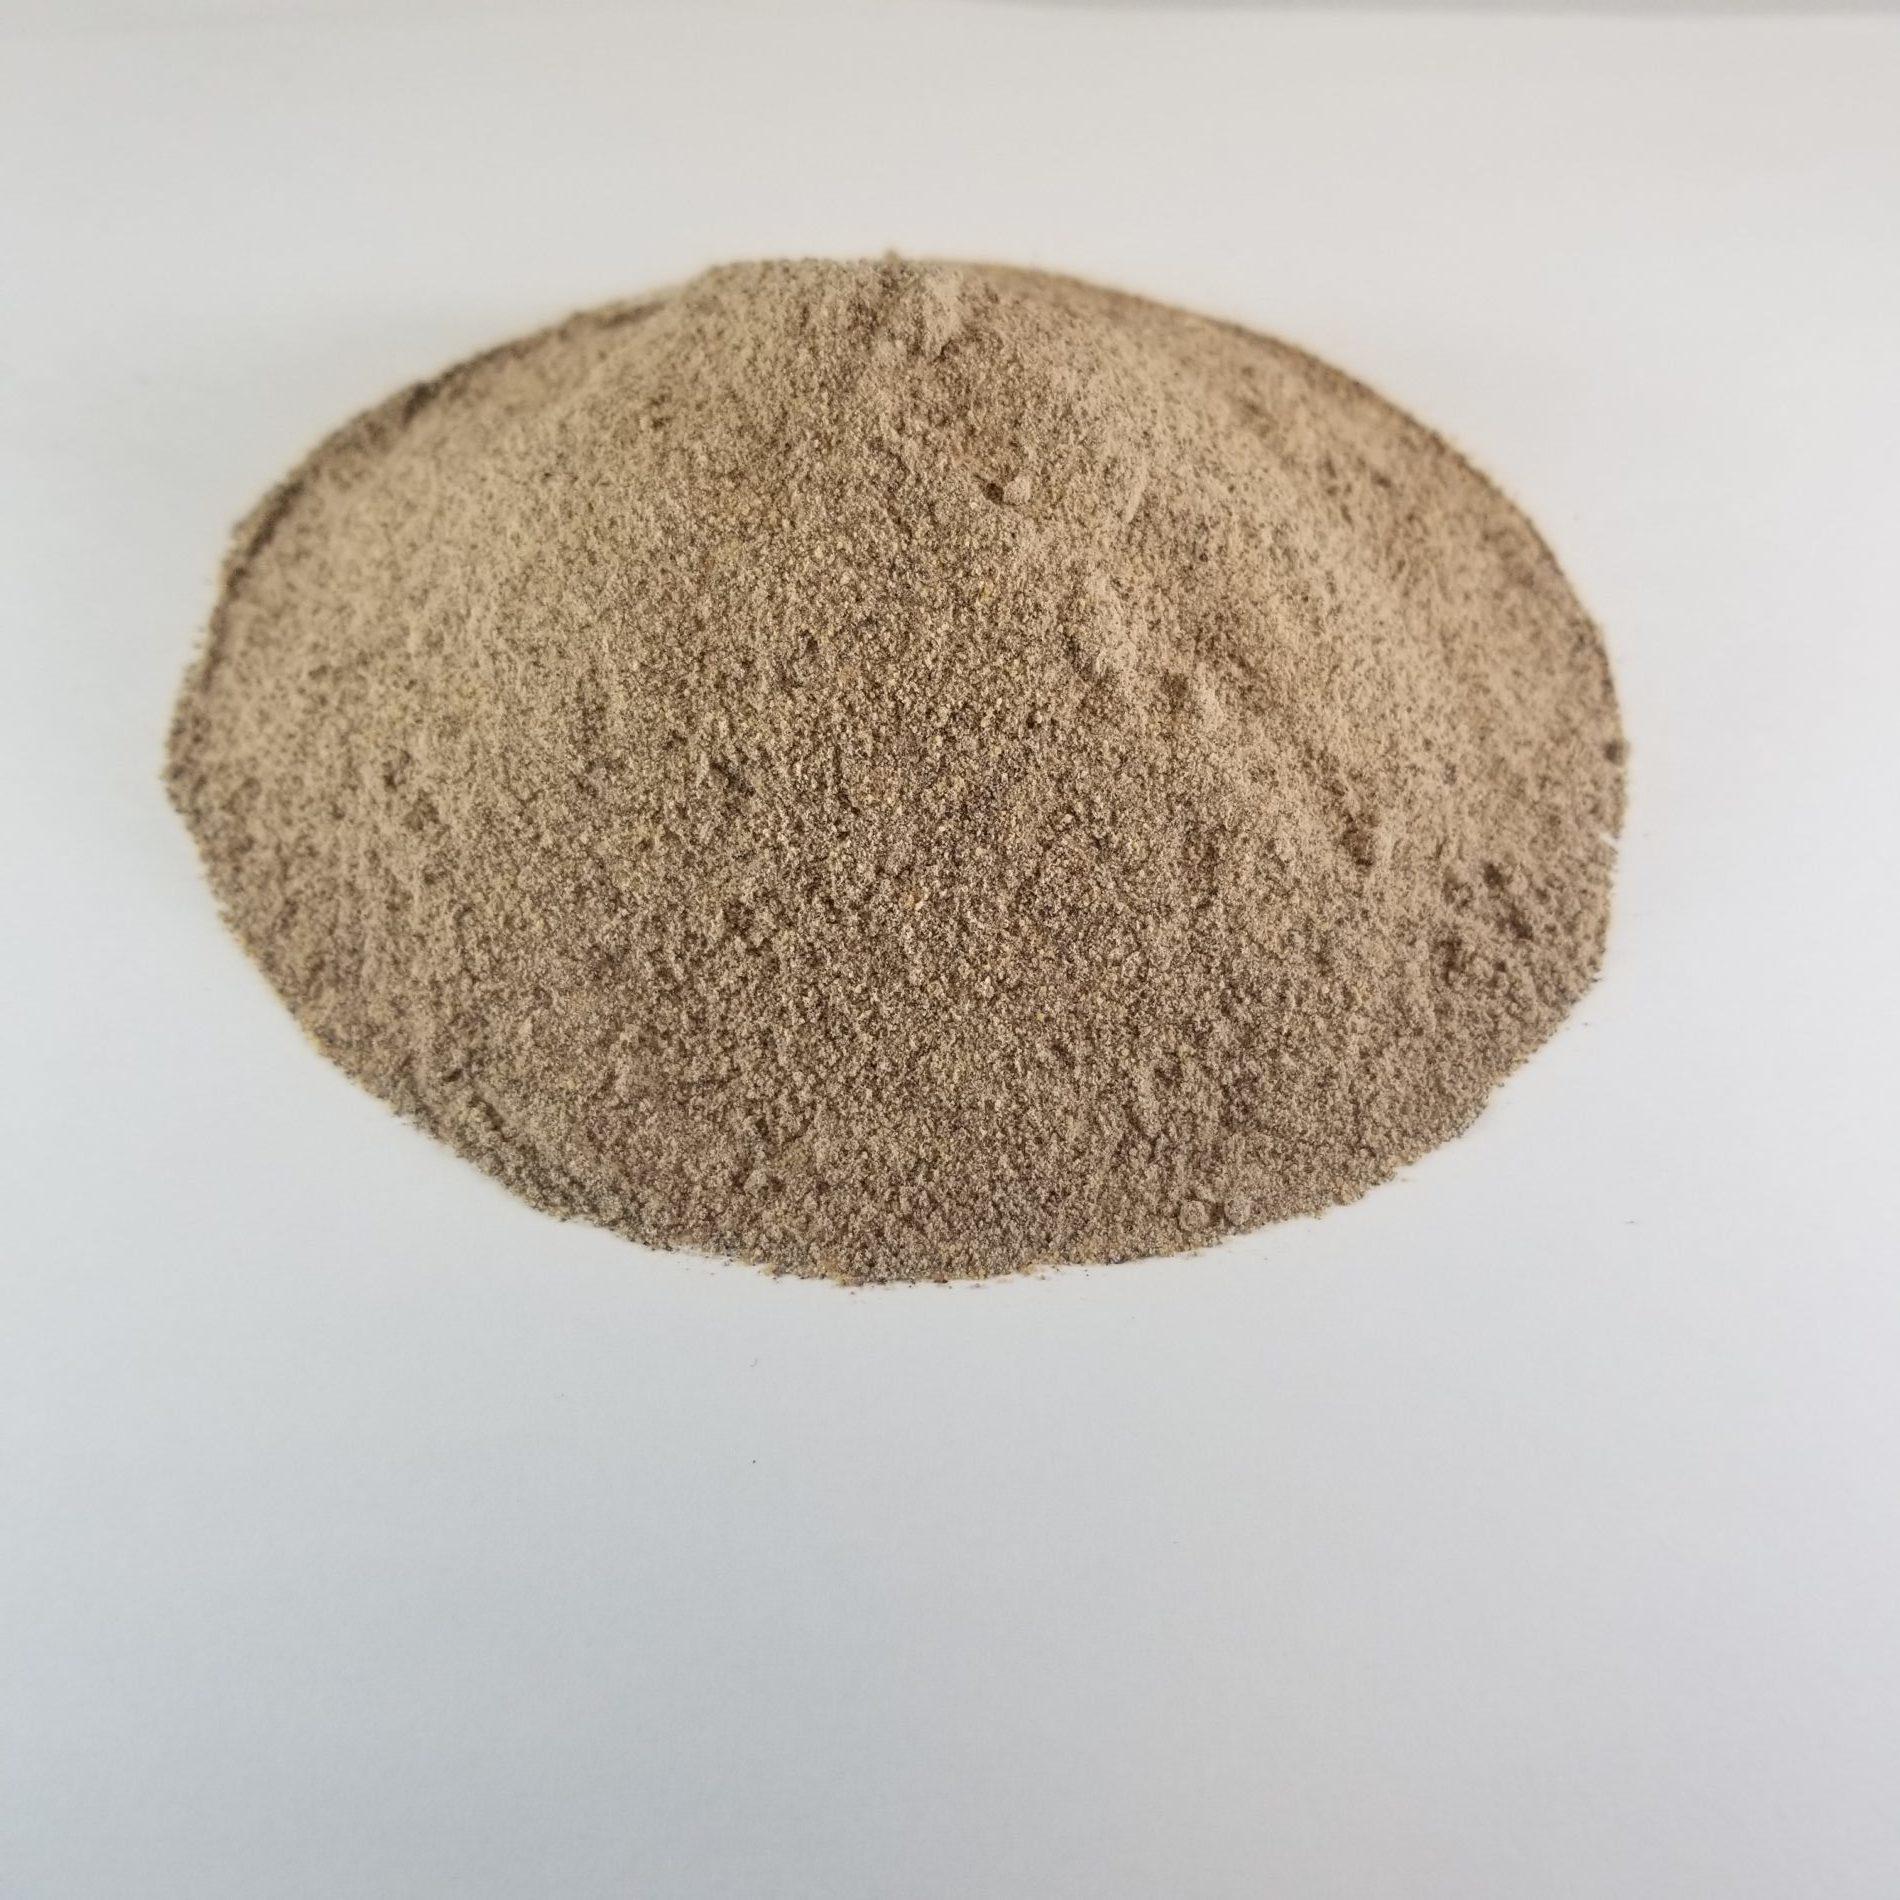 Organic Black Bean Powder, 50LB Bag